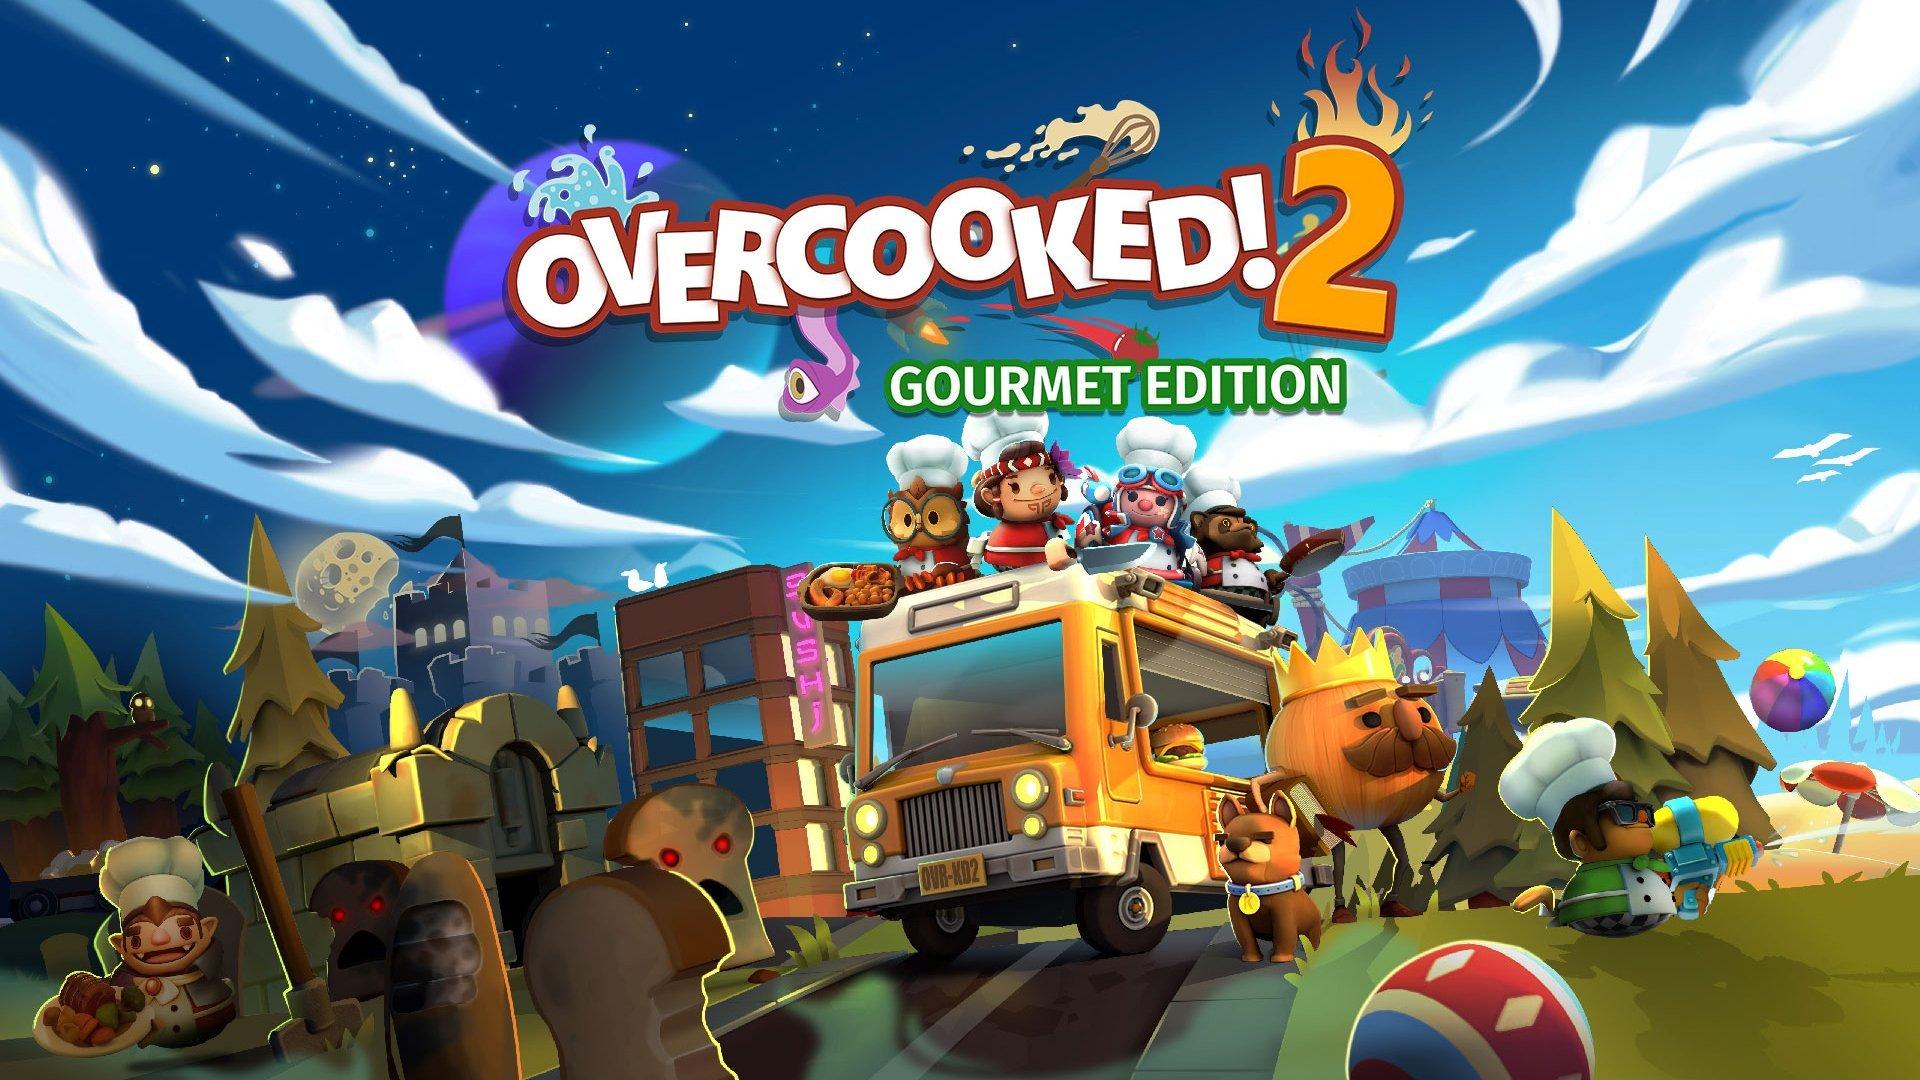 Overcooked! 2: Gourmet Edition 煮過頭2 美食家版